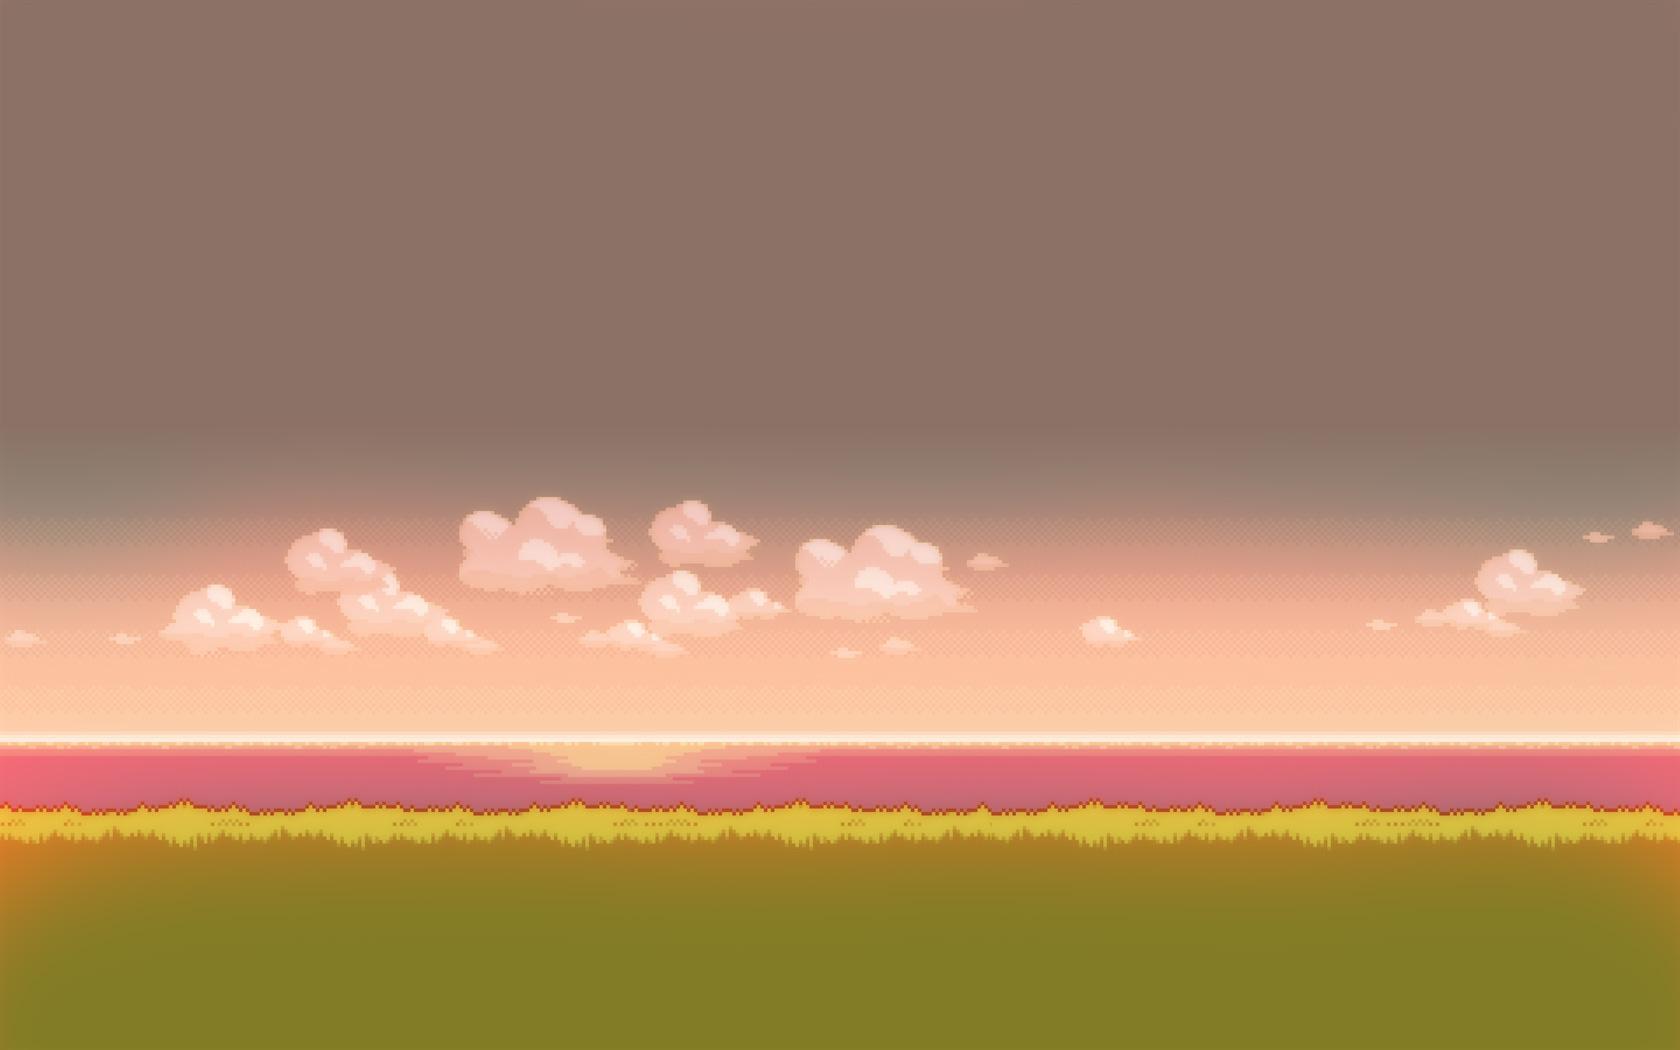 bit landscape iimgurcom 1680x1050